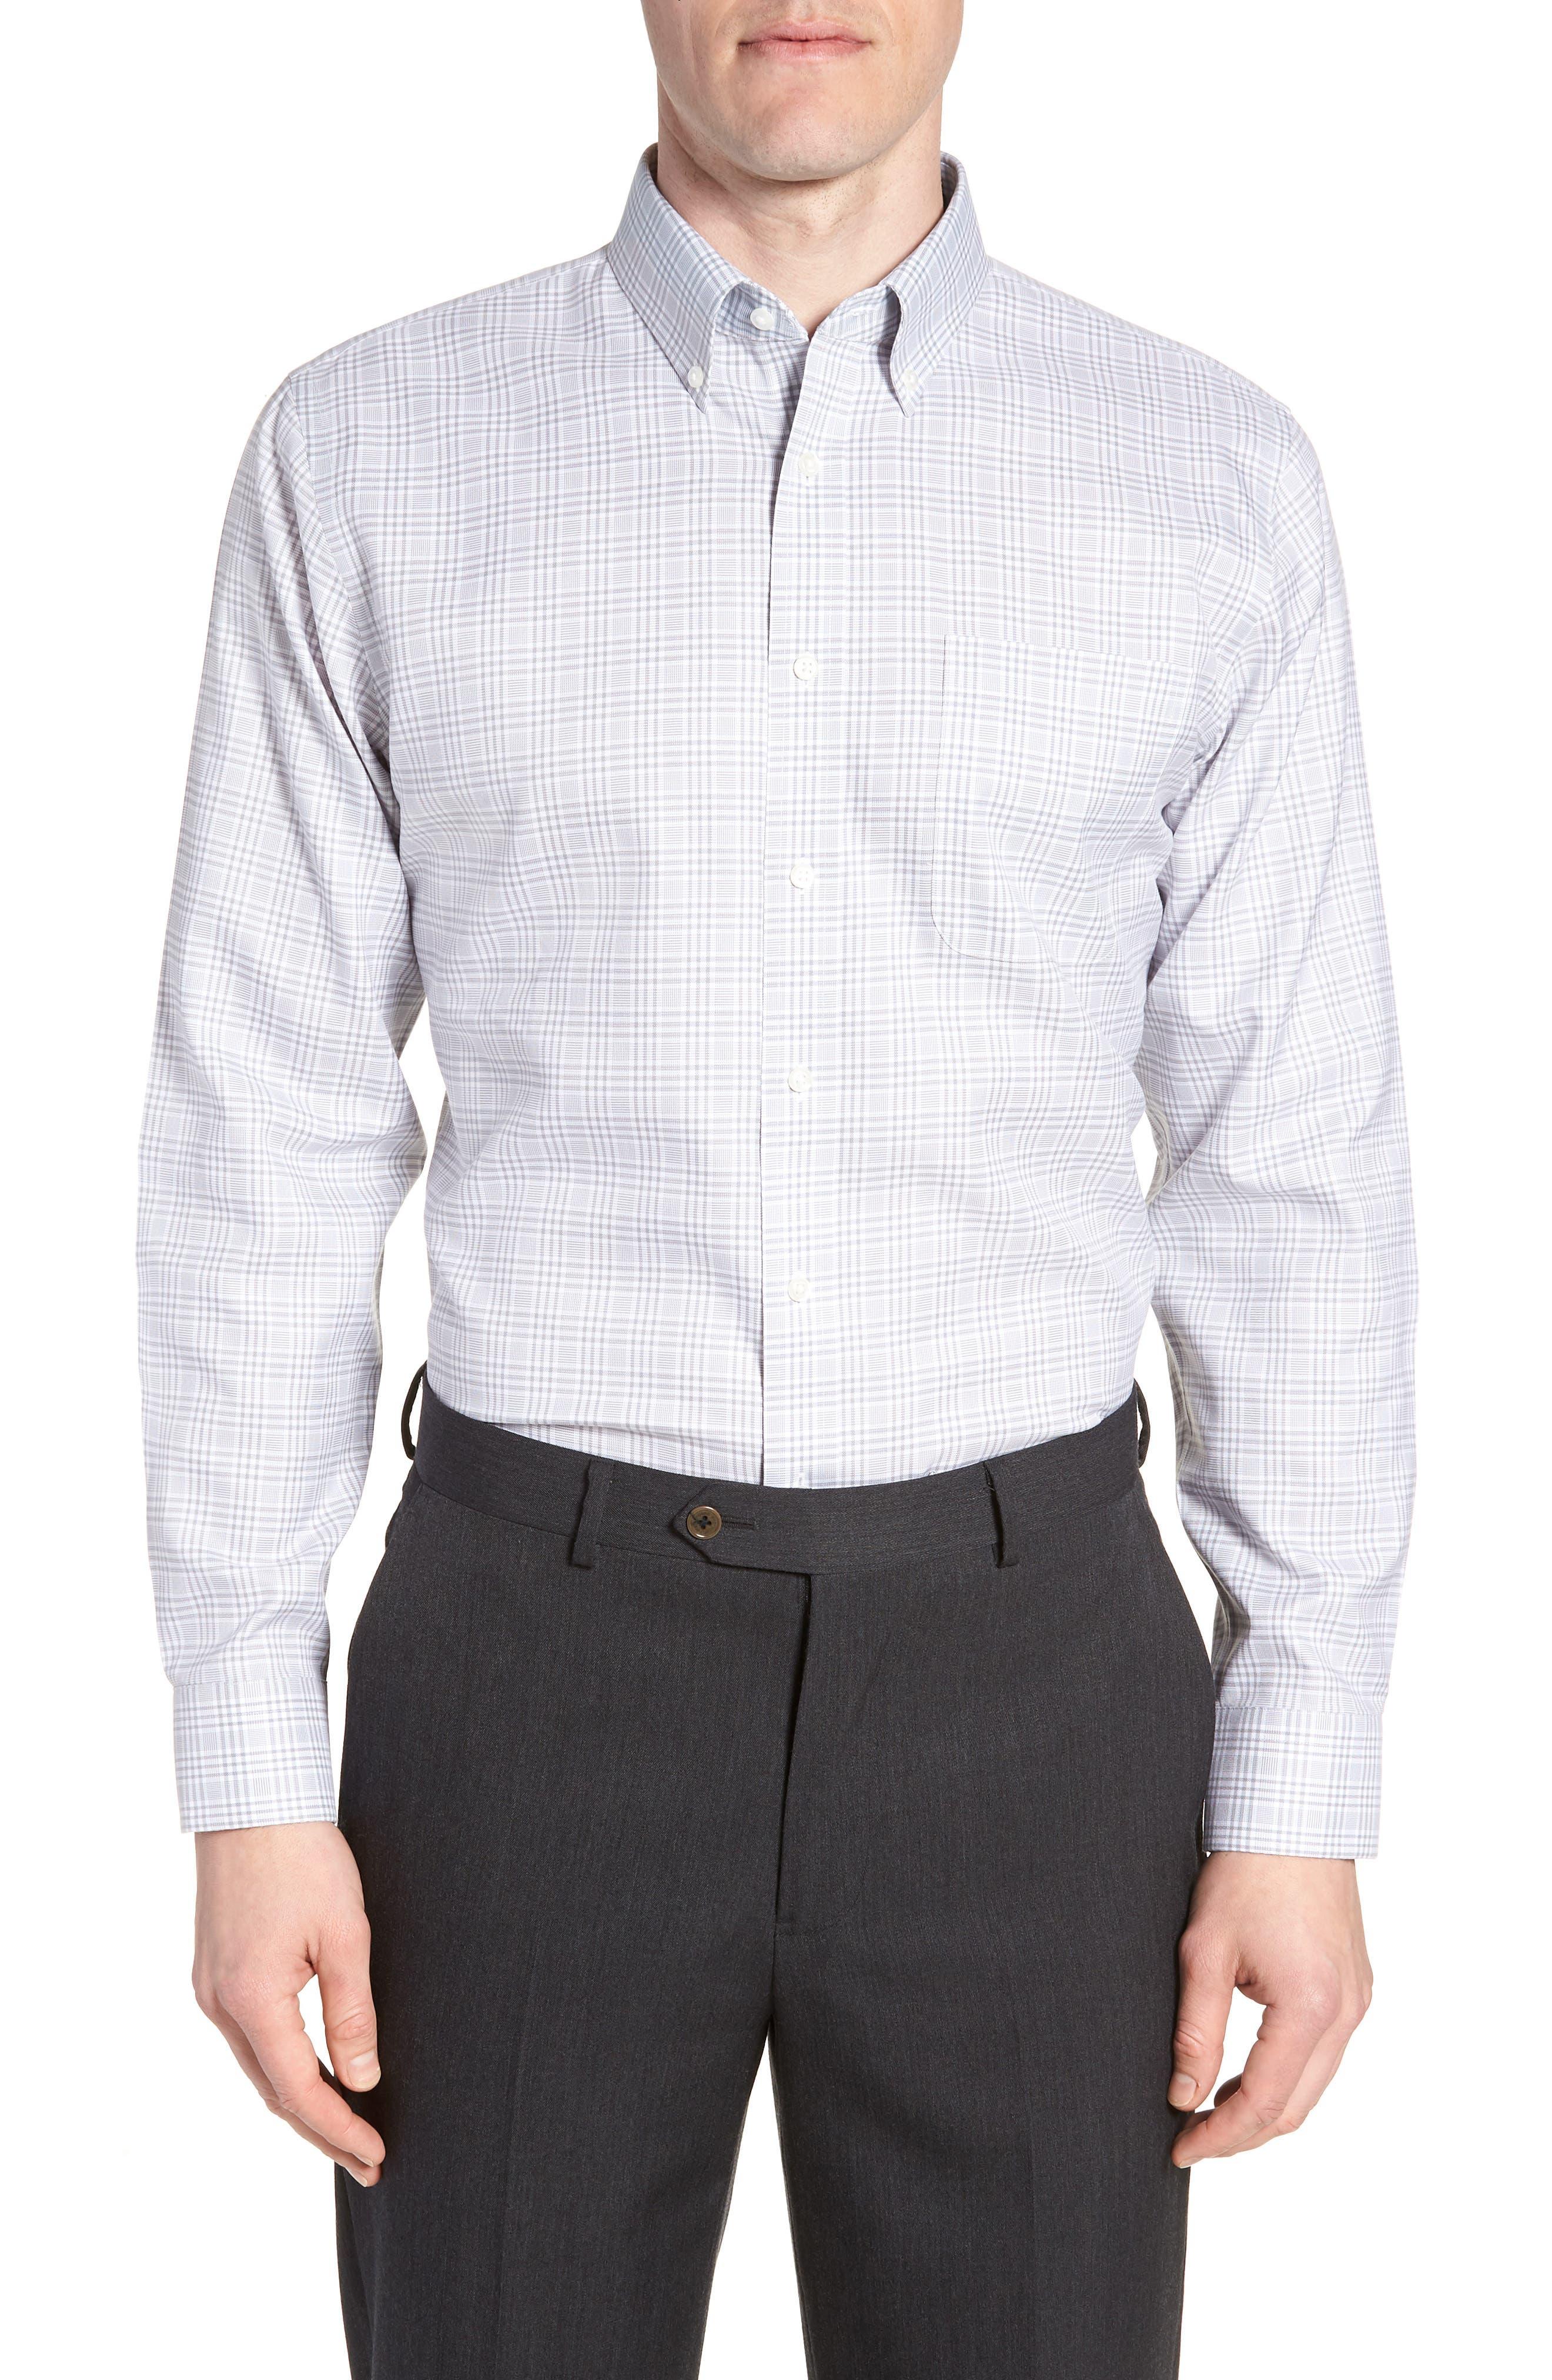 Smartcare<sup>™</sup> Traditional Fit Plaid Dress Shirt,                             Main thumbnail 1, color,                             Grey Sleet